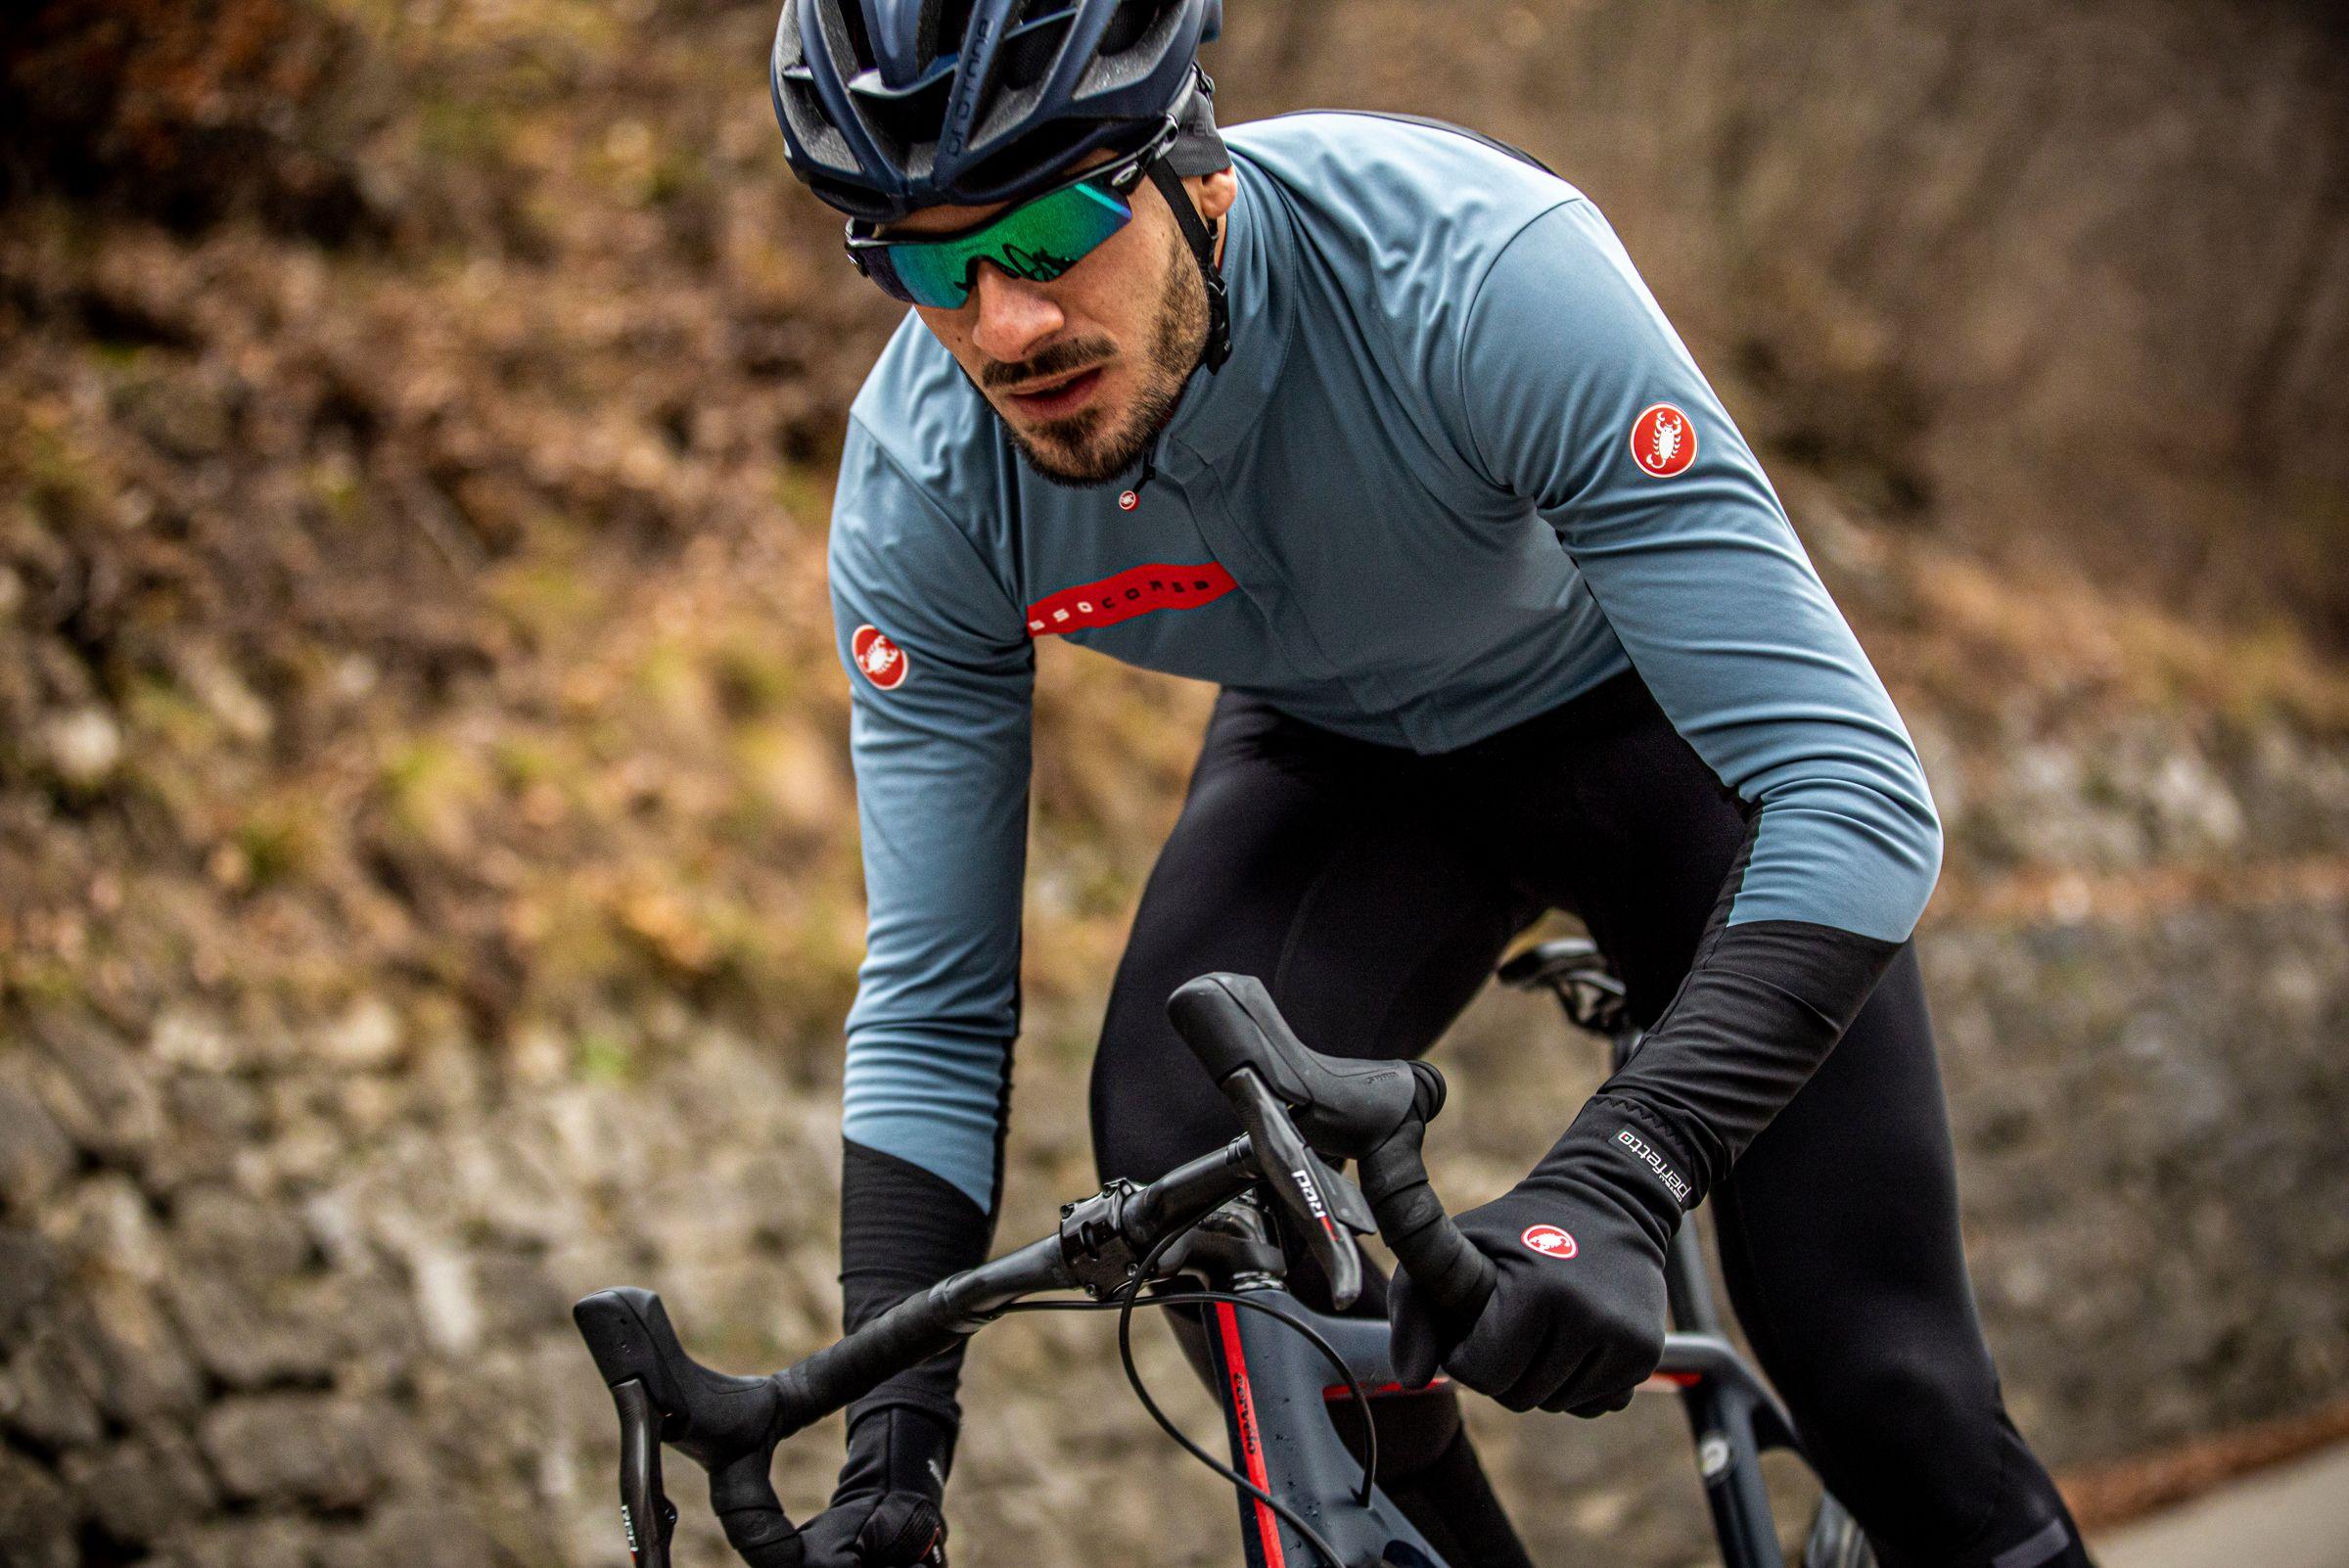 Castelli RoS fietskleding